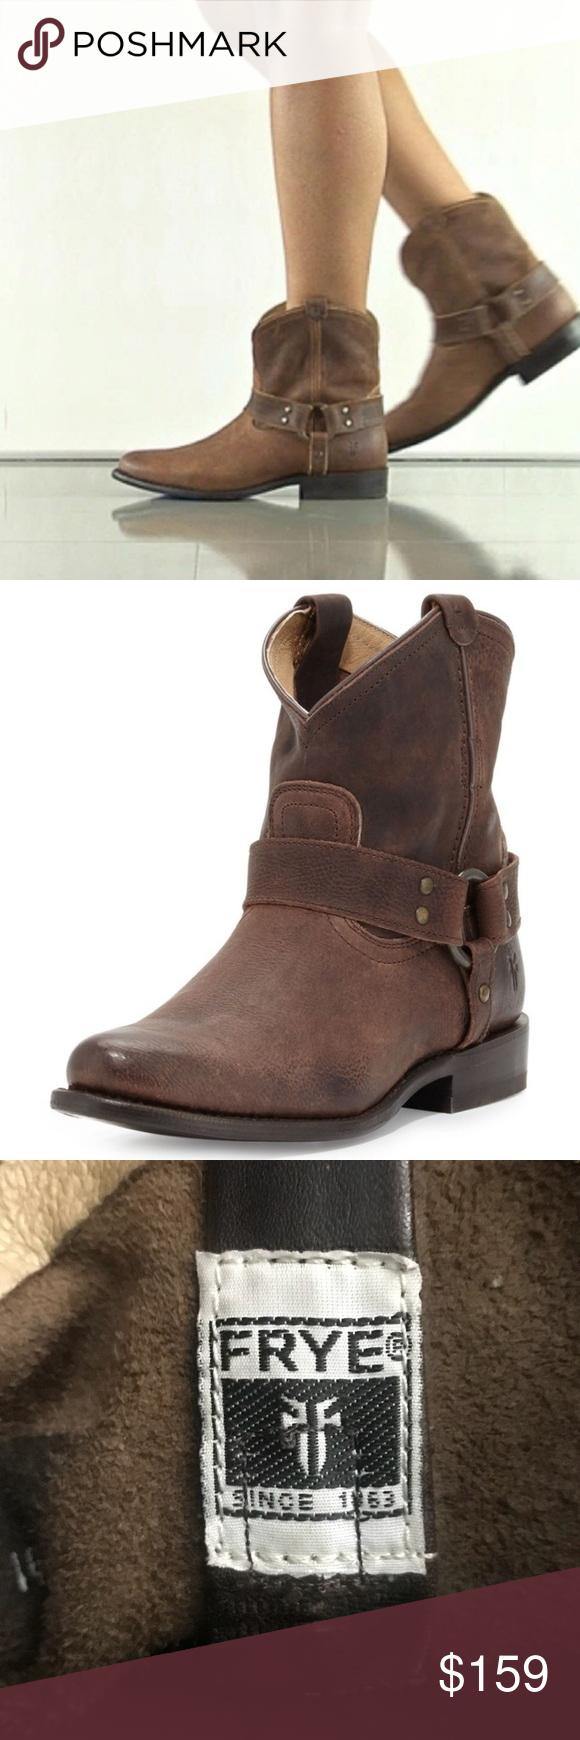 Frye Wyatt Harness Short Leather Boots Size 9.5 Frye Wyatt